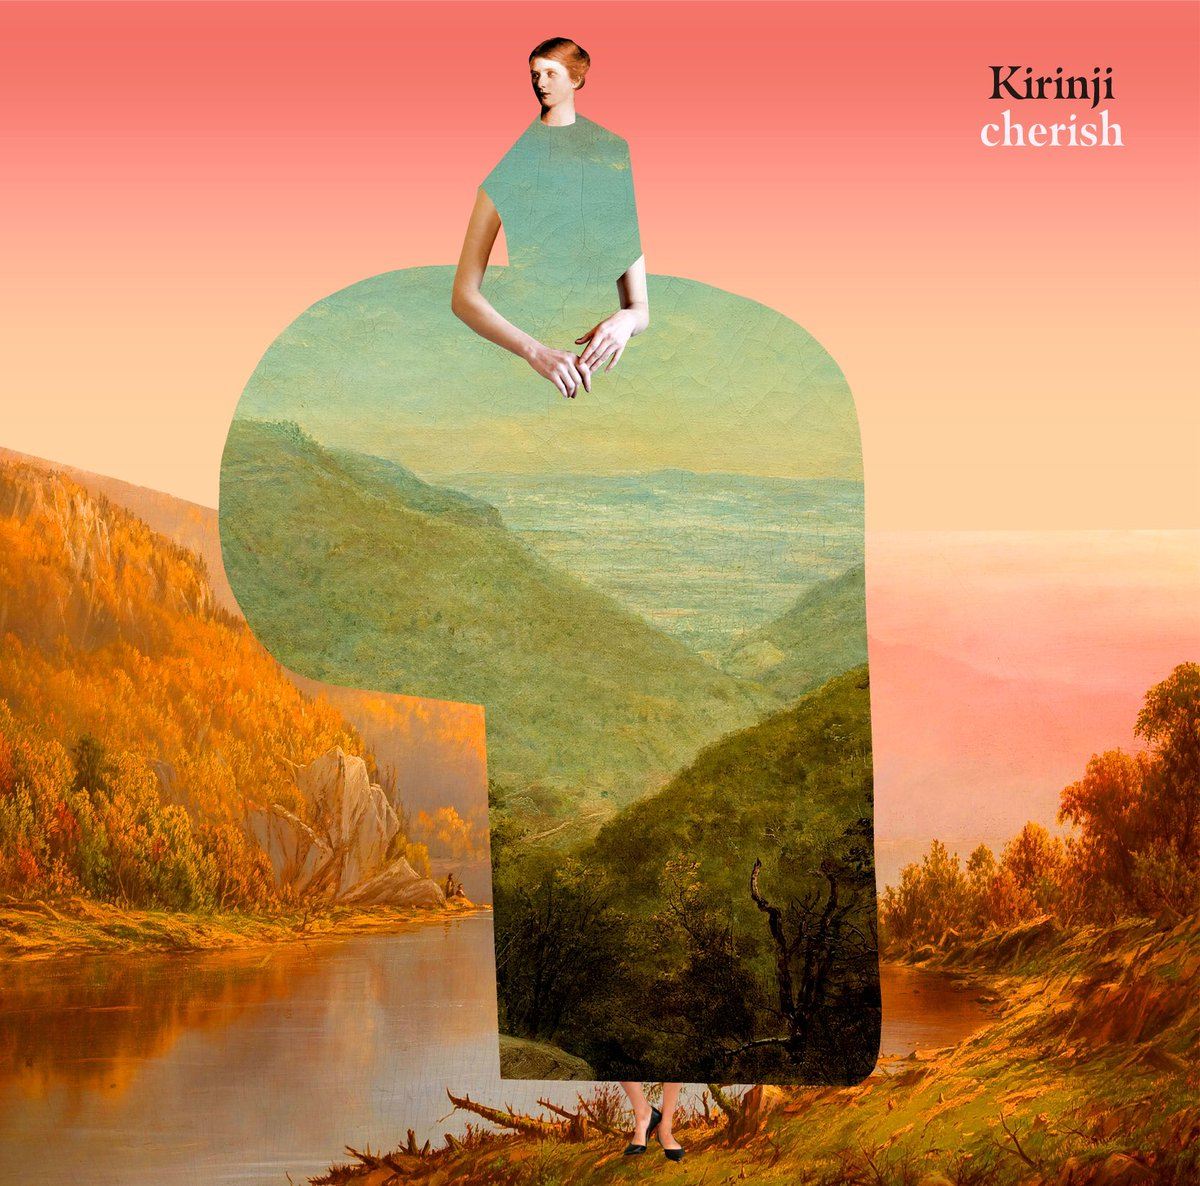 KIRINJIのニューアルバム「cherish」デザインしてます(現在入稿作業中)アートワークはJohanna Goodmanさんにお願いしました(画像は通常版と初回限定版)鎮座DOPENESSさん(!)とのエモーショナルなコラボ曲をはじめ、ひたすらカッコいいアルバムです。11/20発売